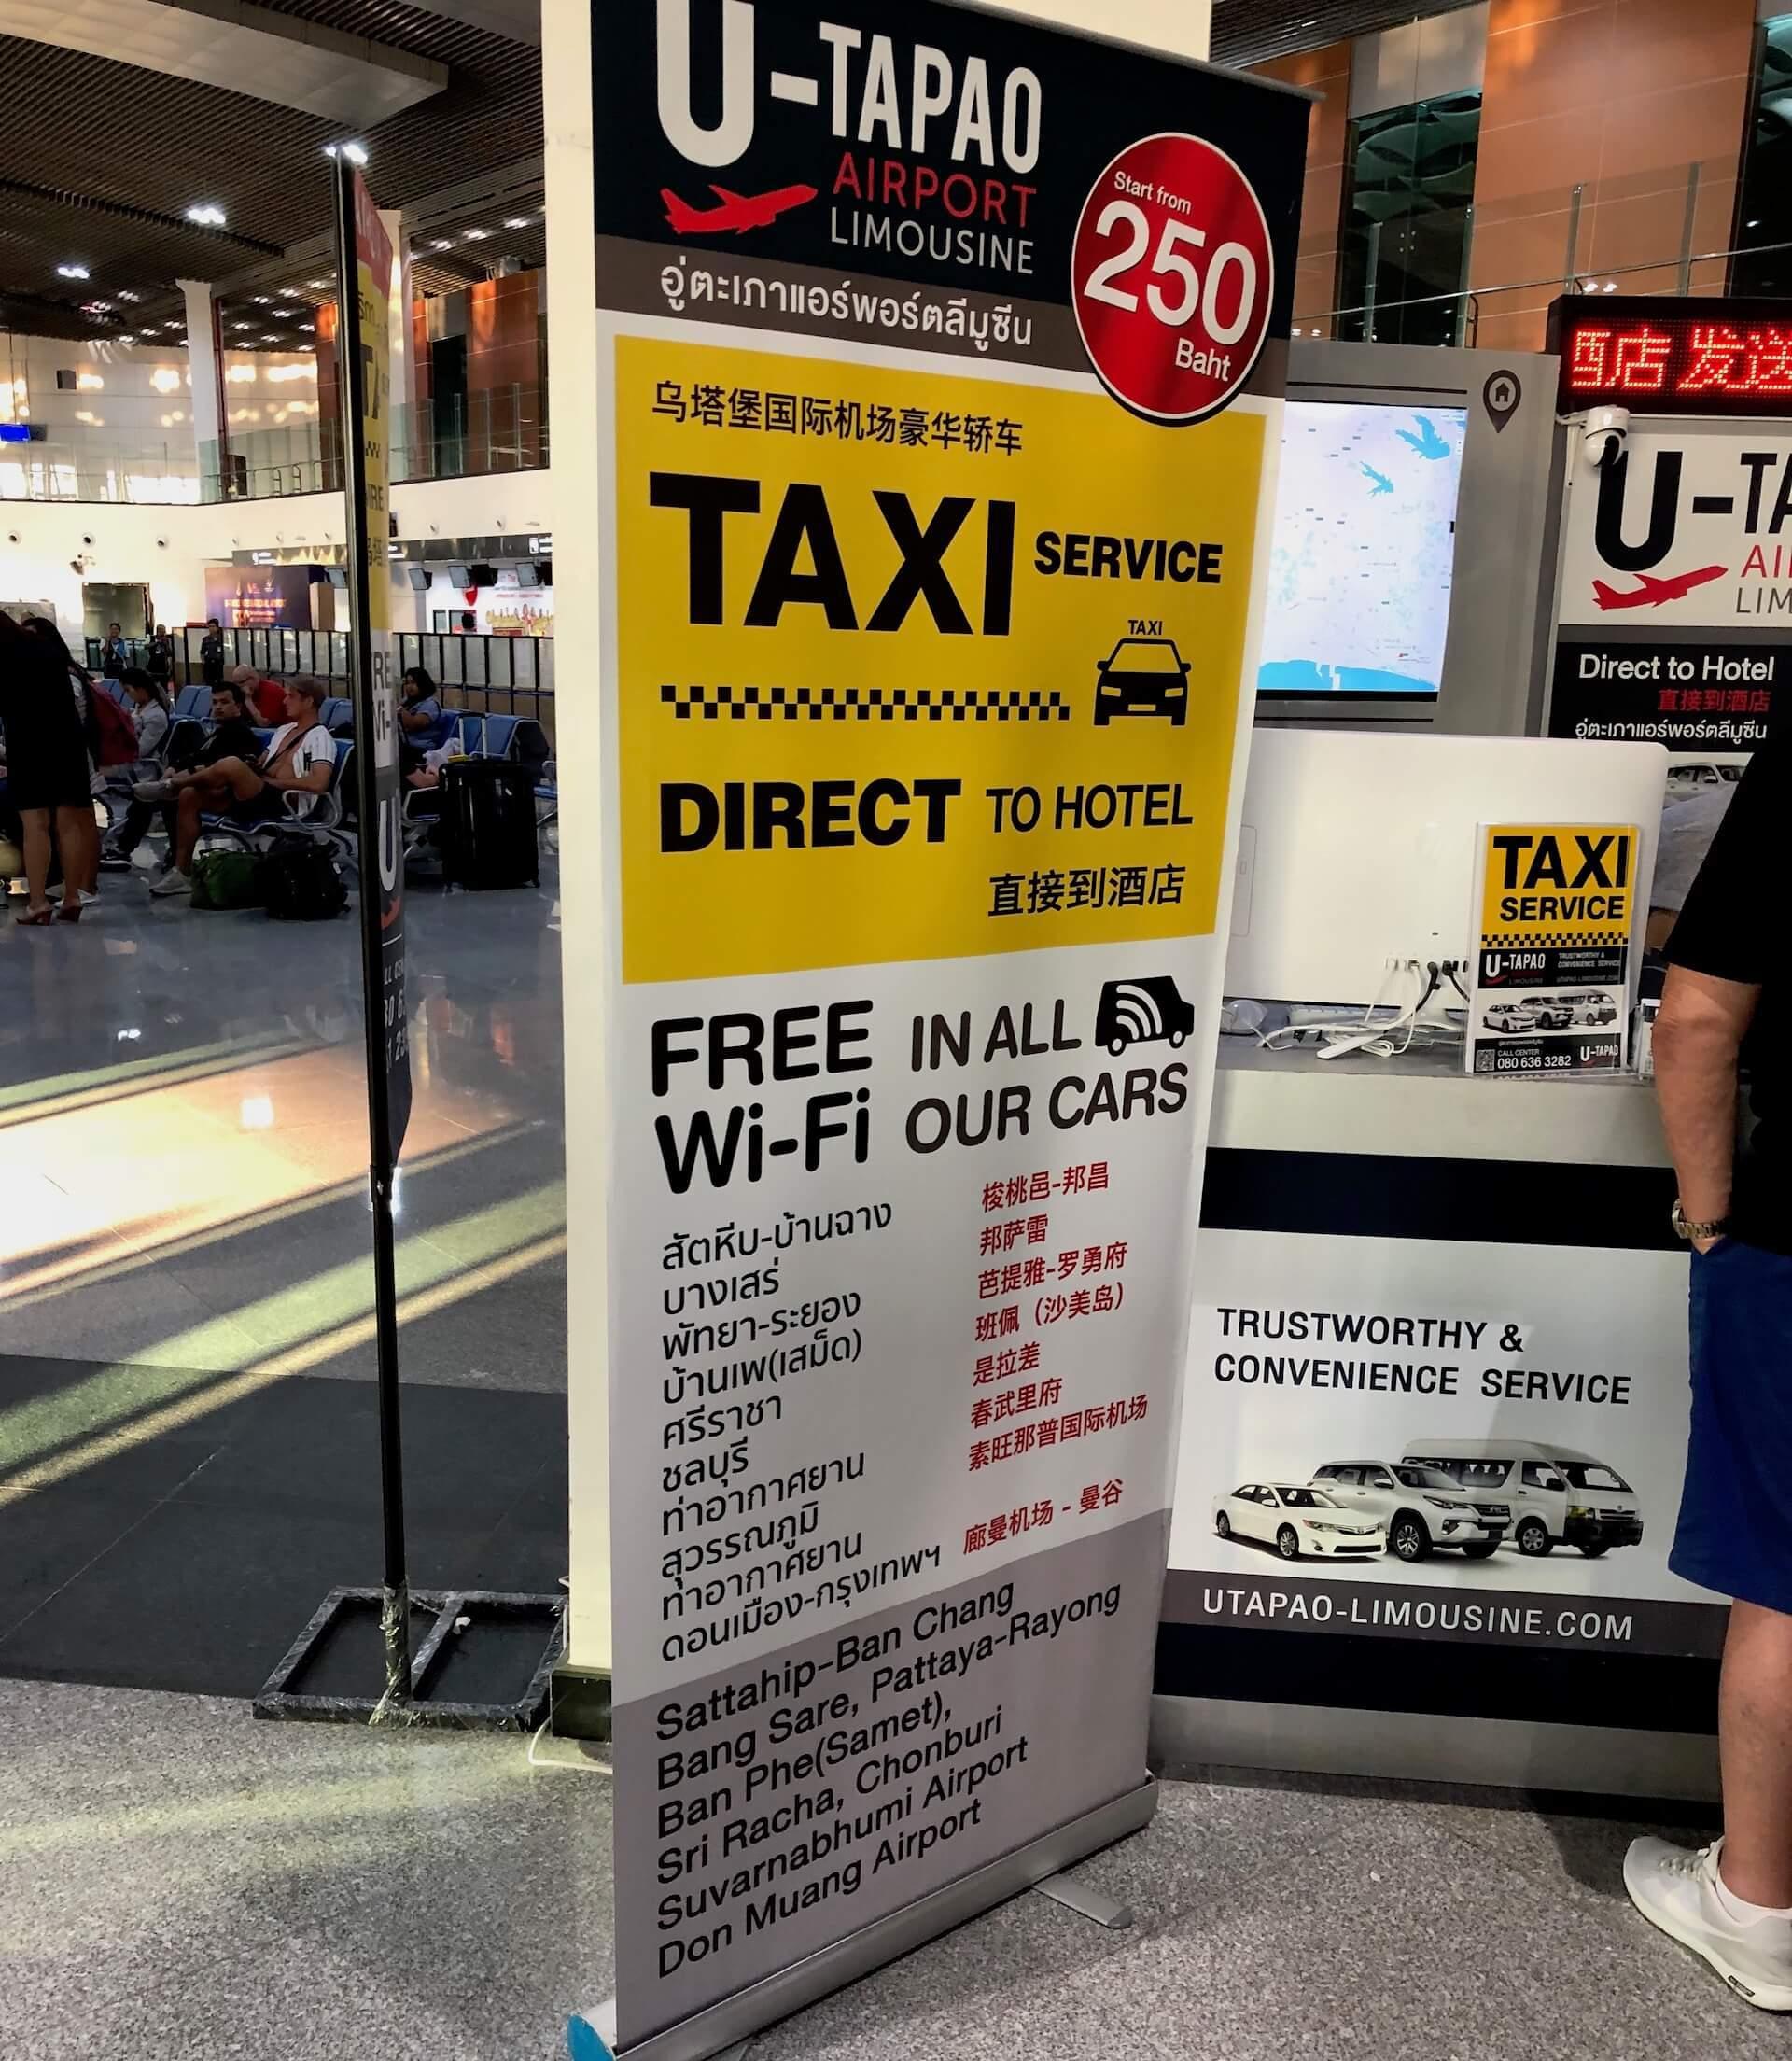 Taxi Service Flughafen Pattaya